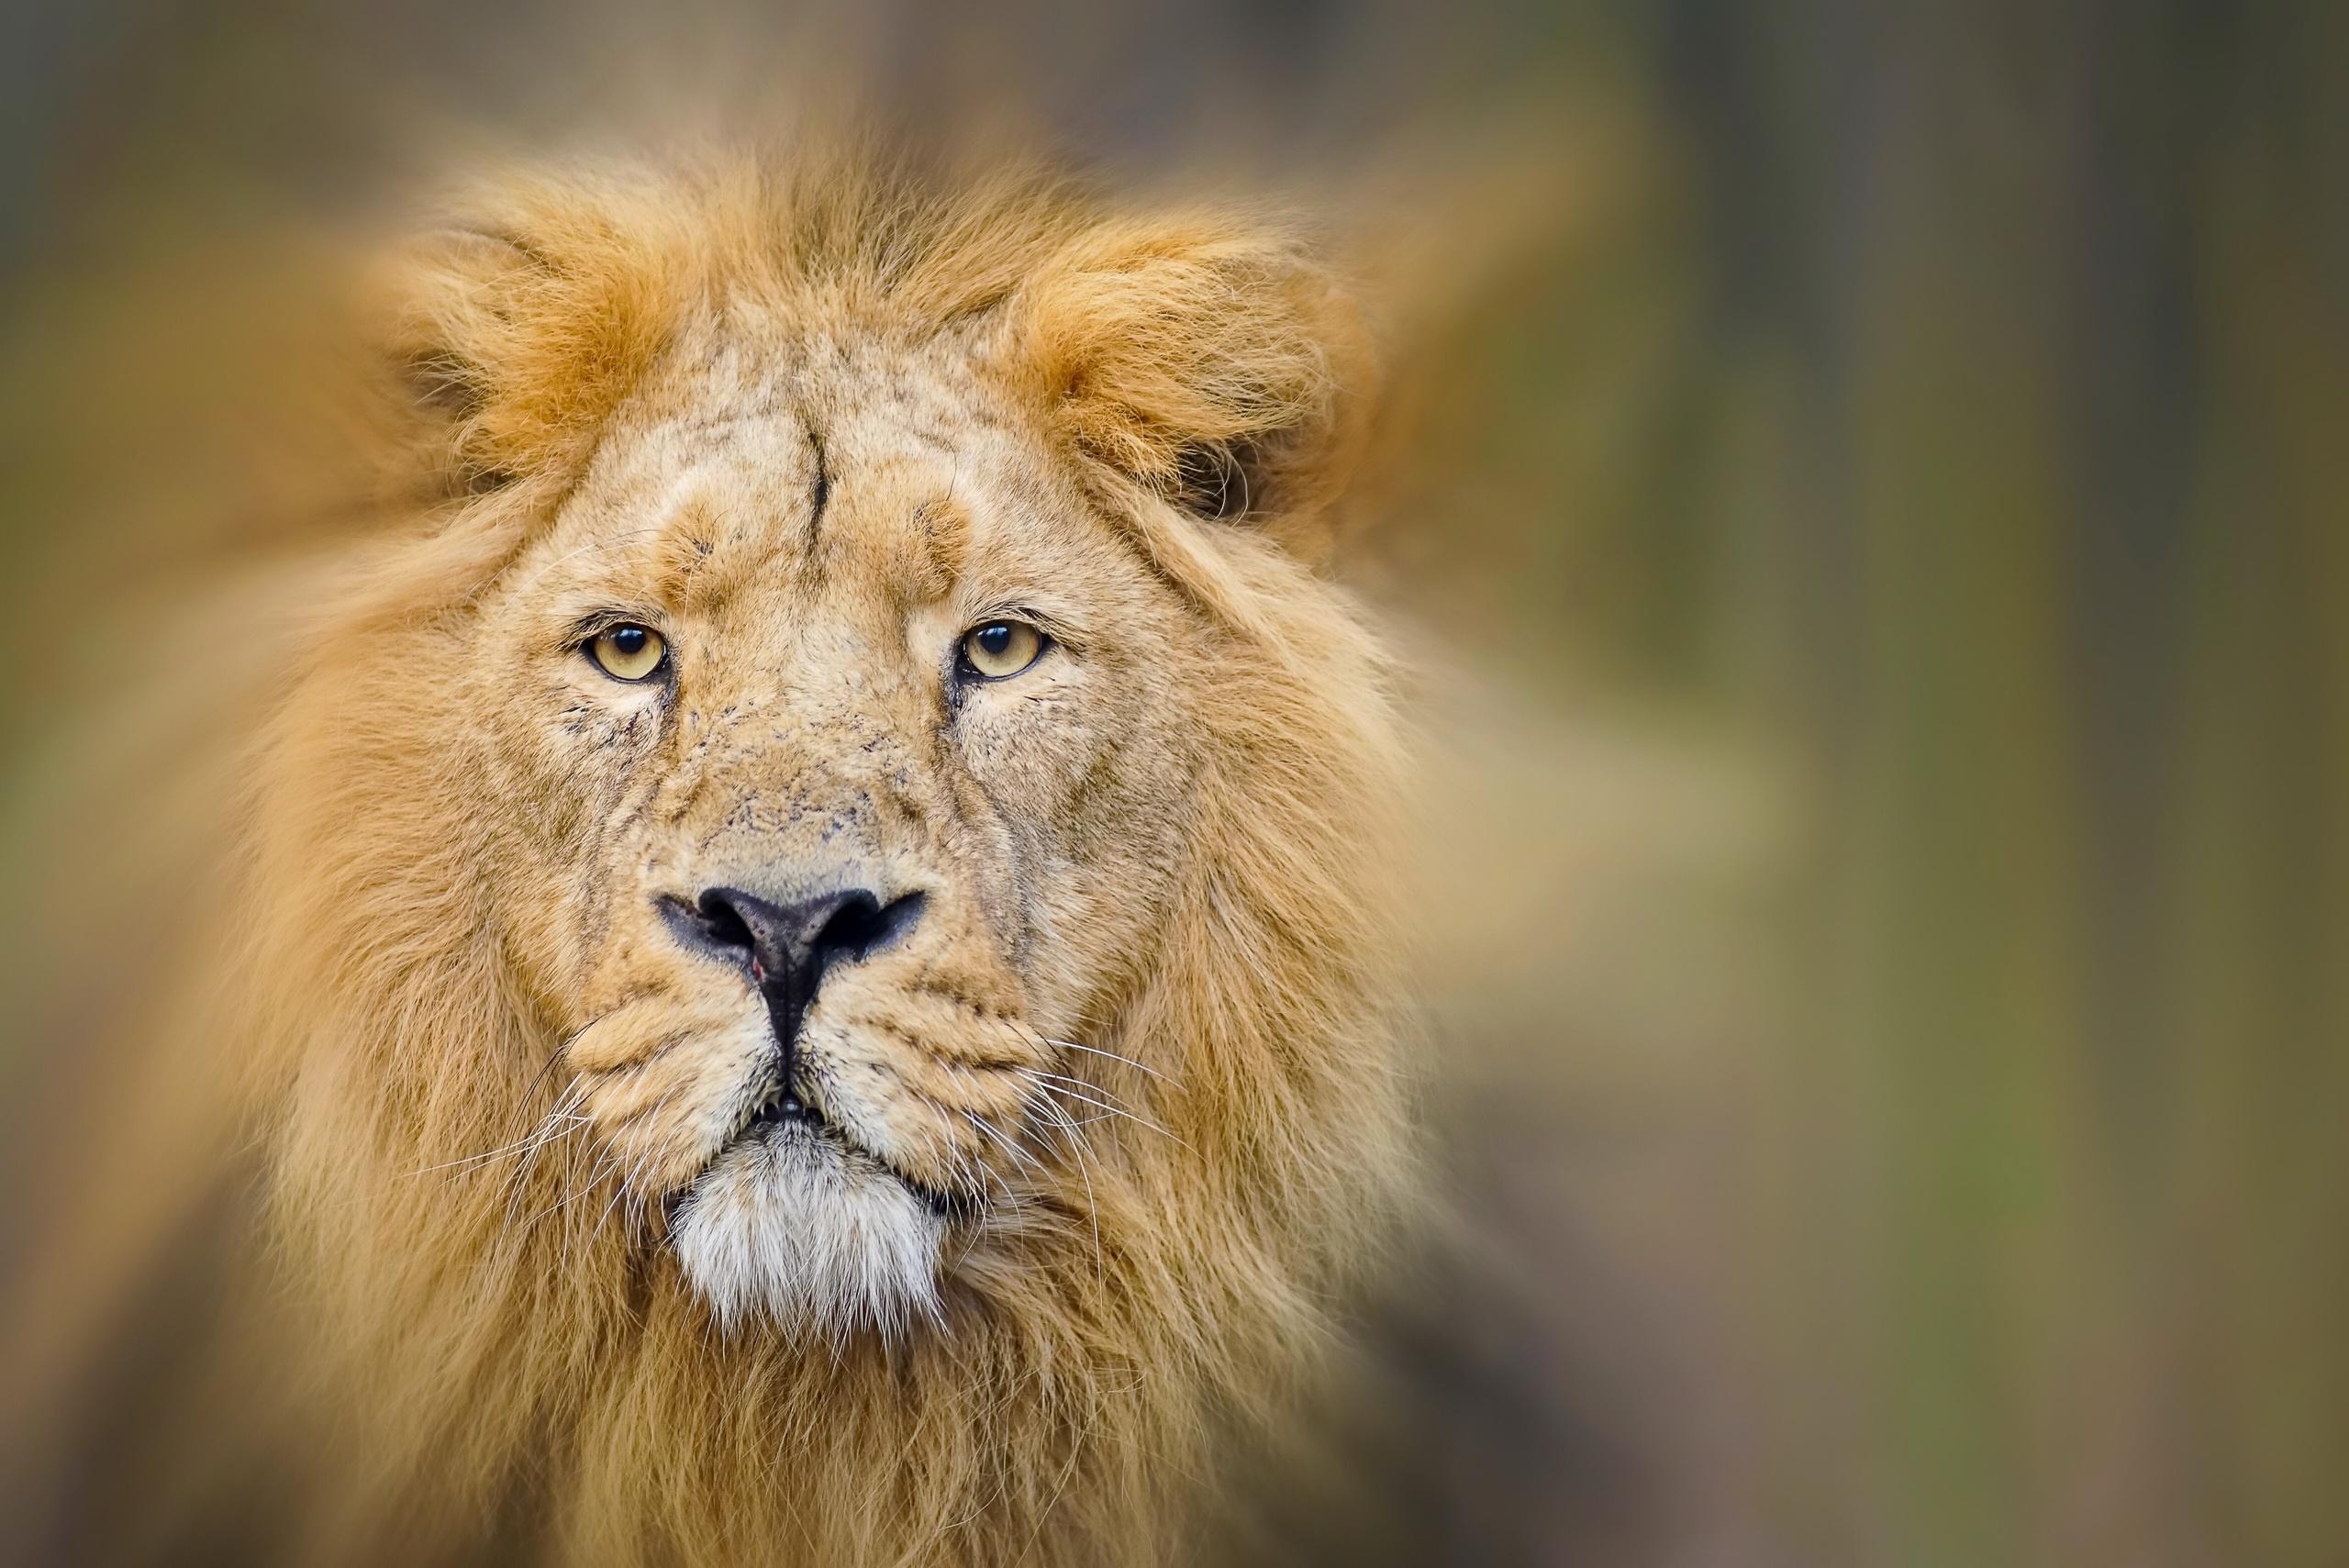 картинки на рабочий лев на природе